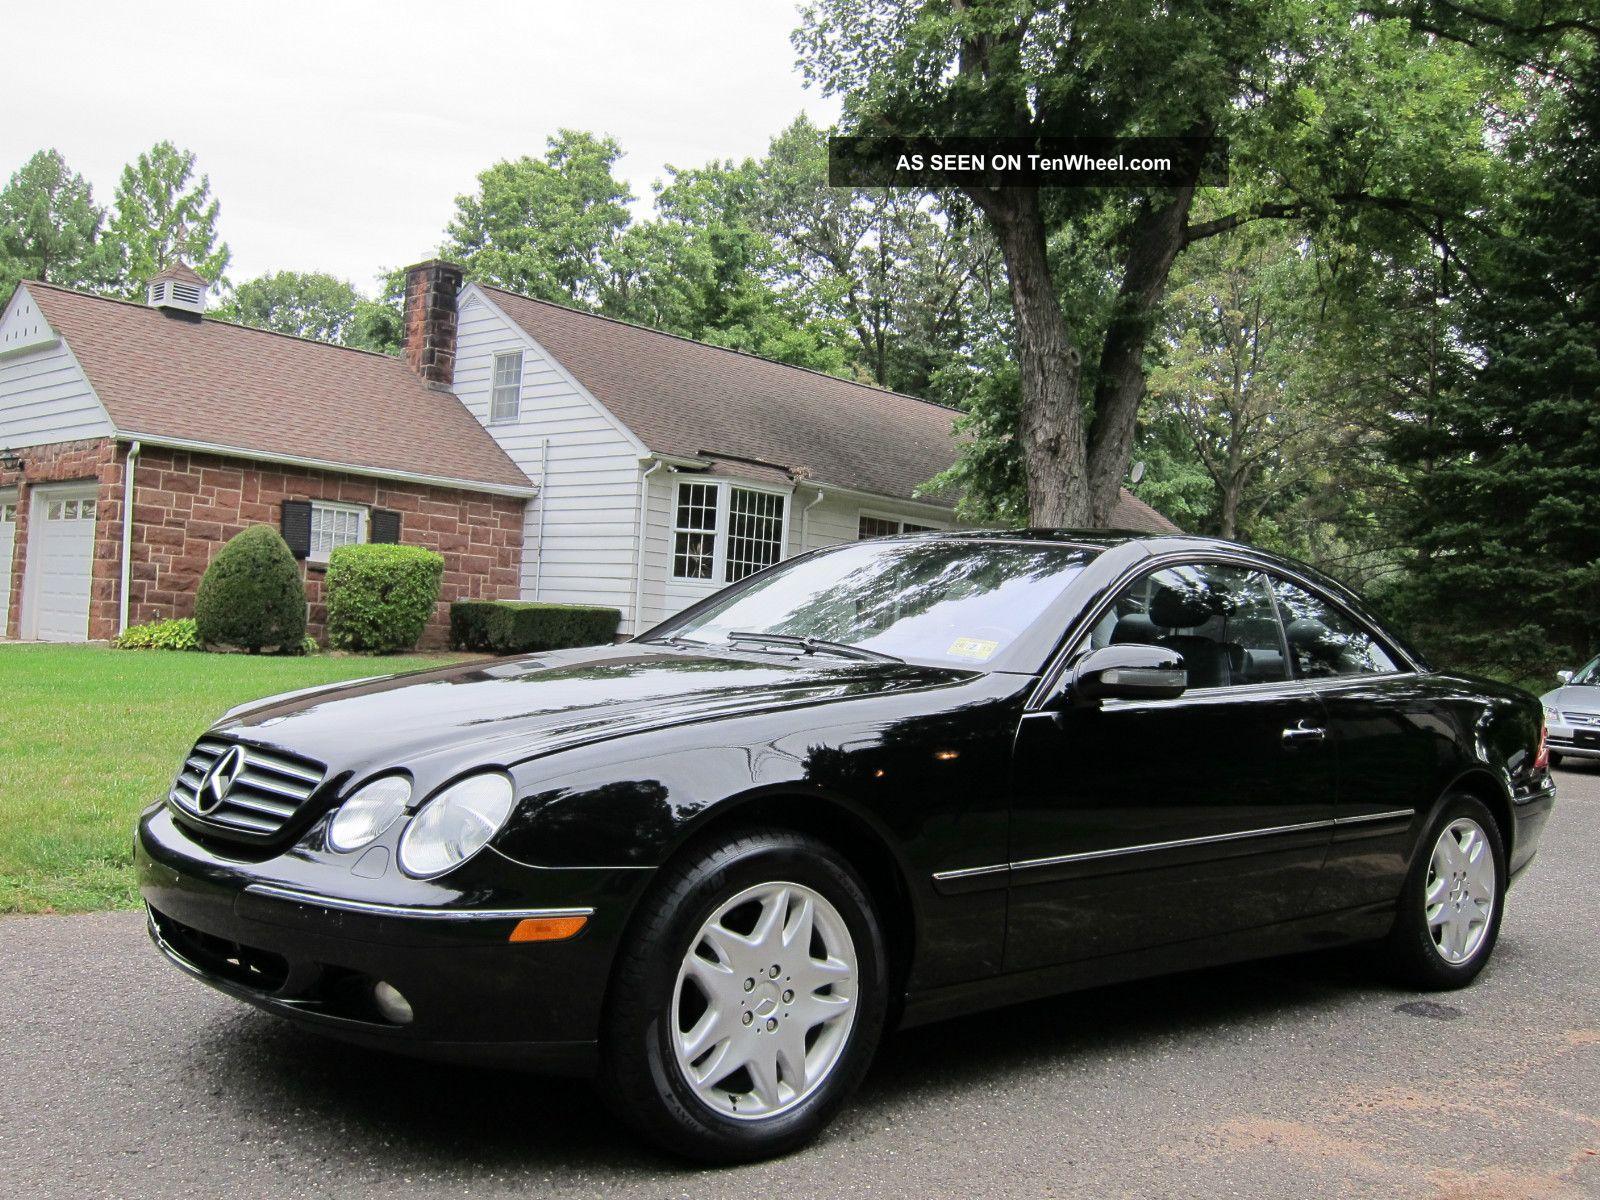 Mercedes benz cl500 2001 prior minor damage for Mercedes benz cl500